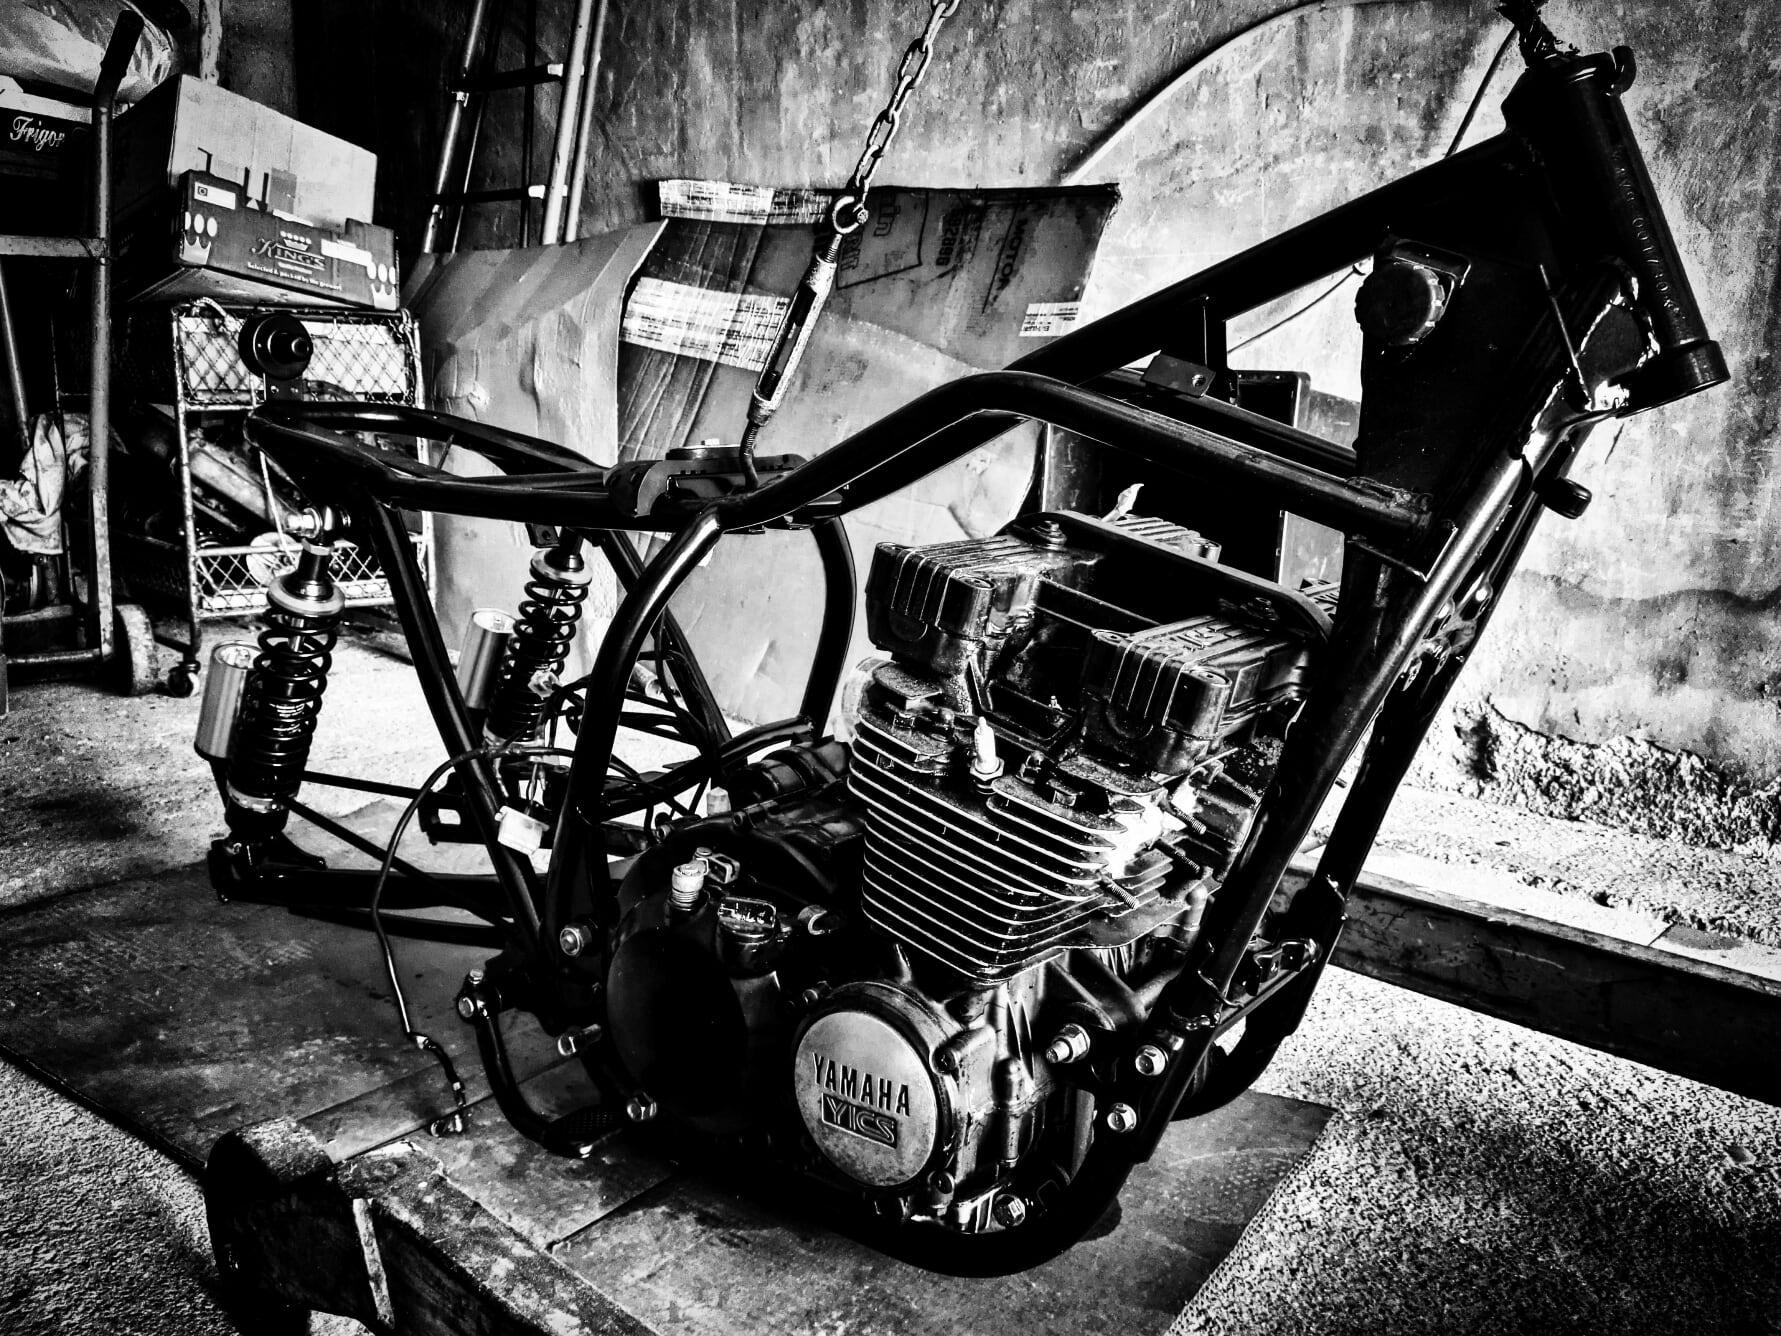 yamaha xj550. blocco motore montato sul telaio.